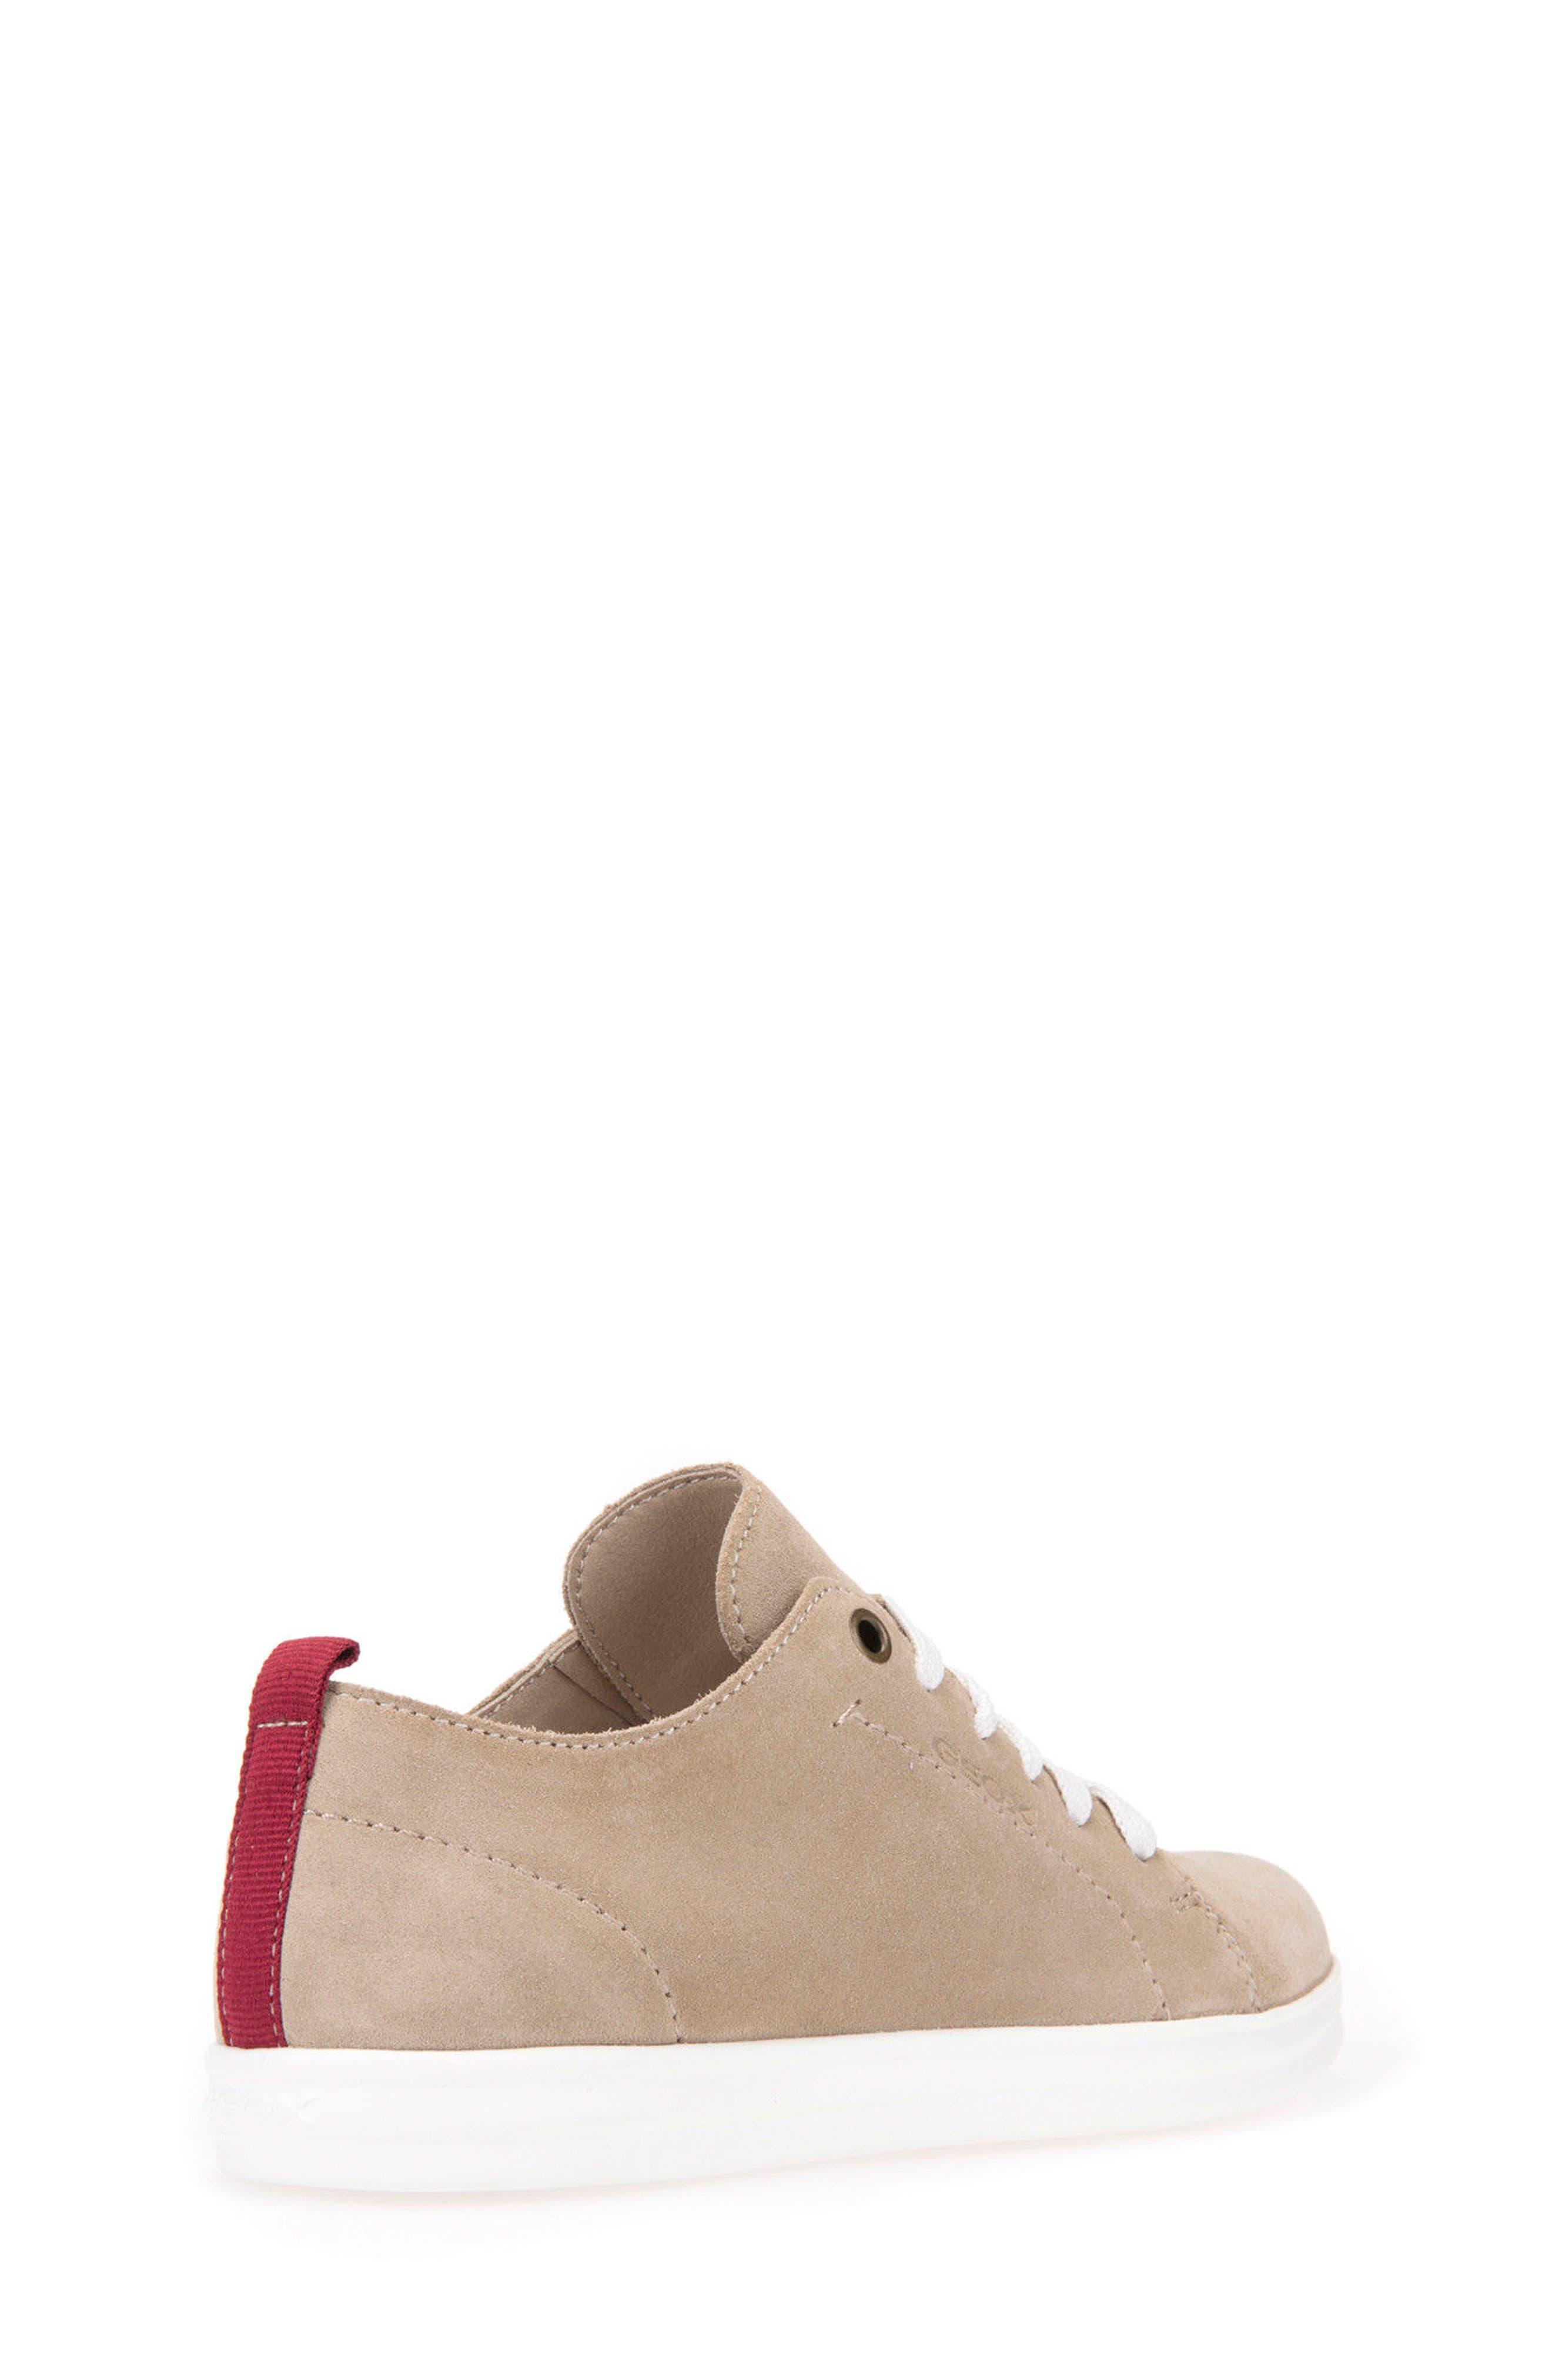 Anthor Low Top Sneaker,                             Alternate thumbnail 2, color,                             BEIGE